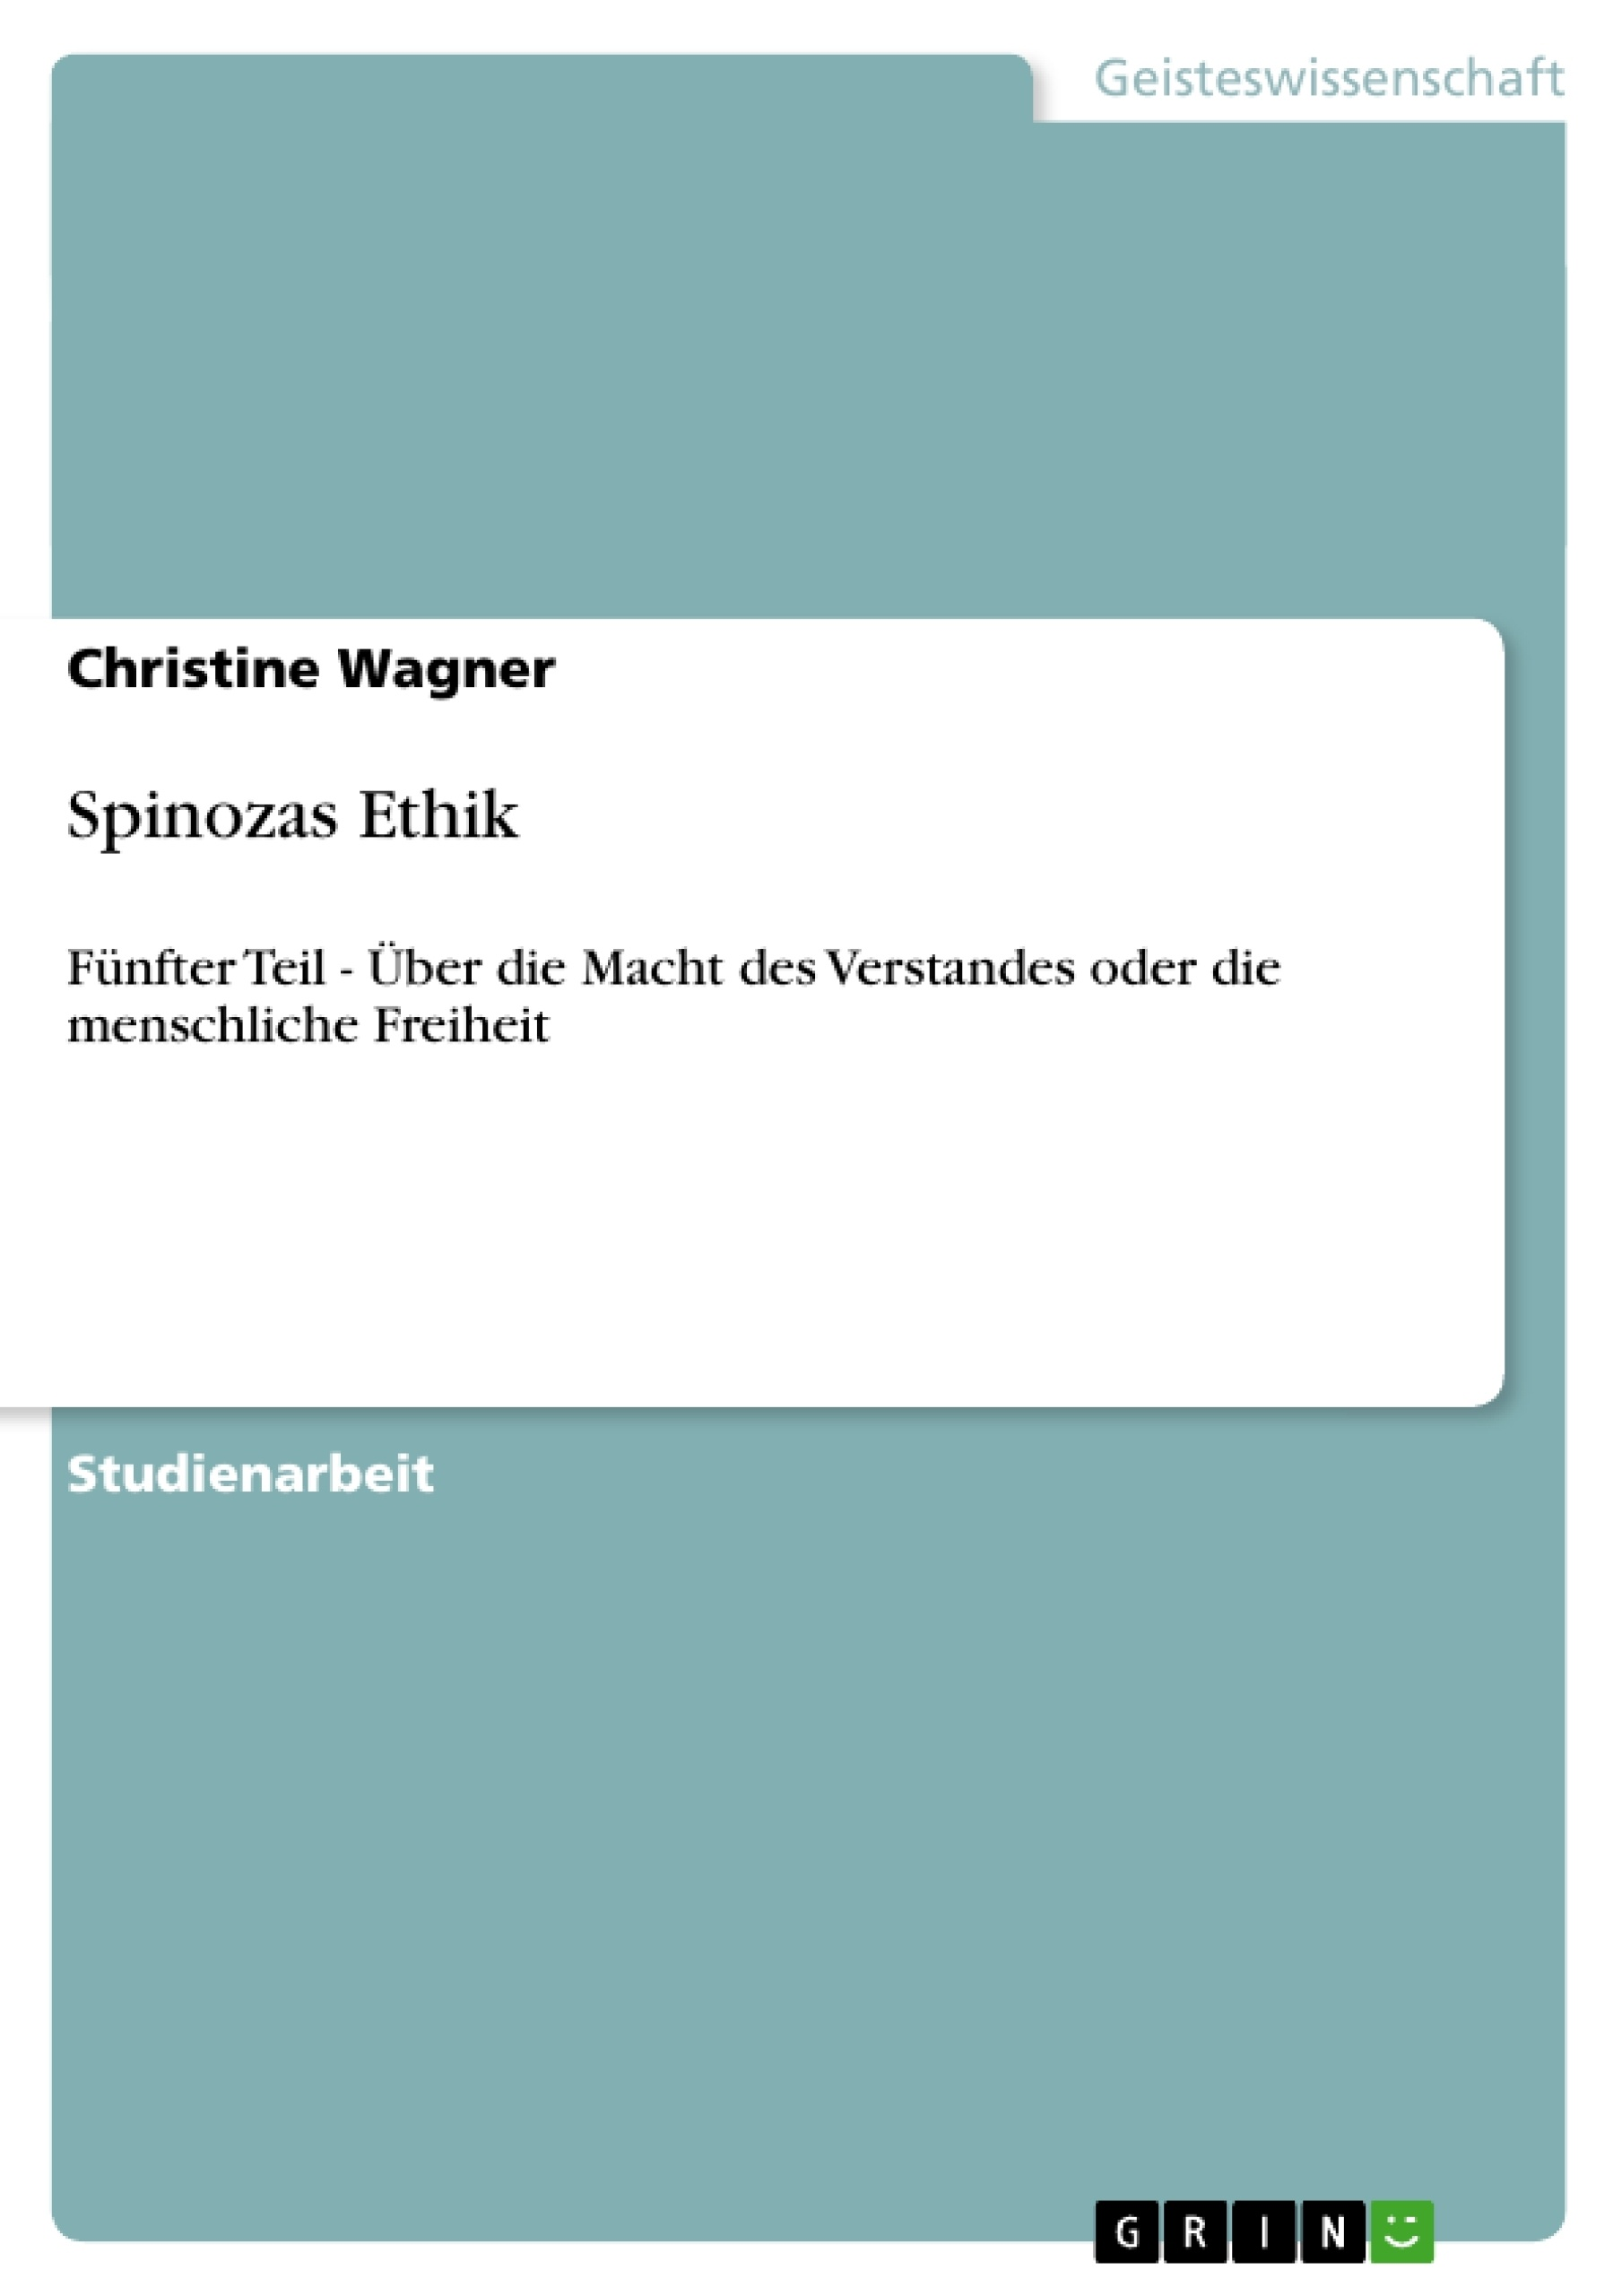 Titel: Spinozas Ethik